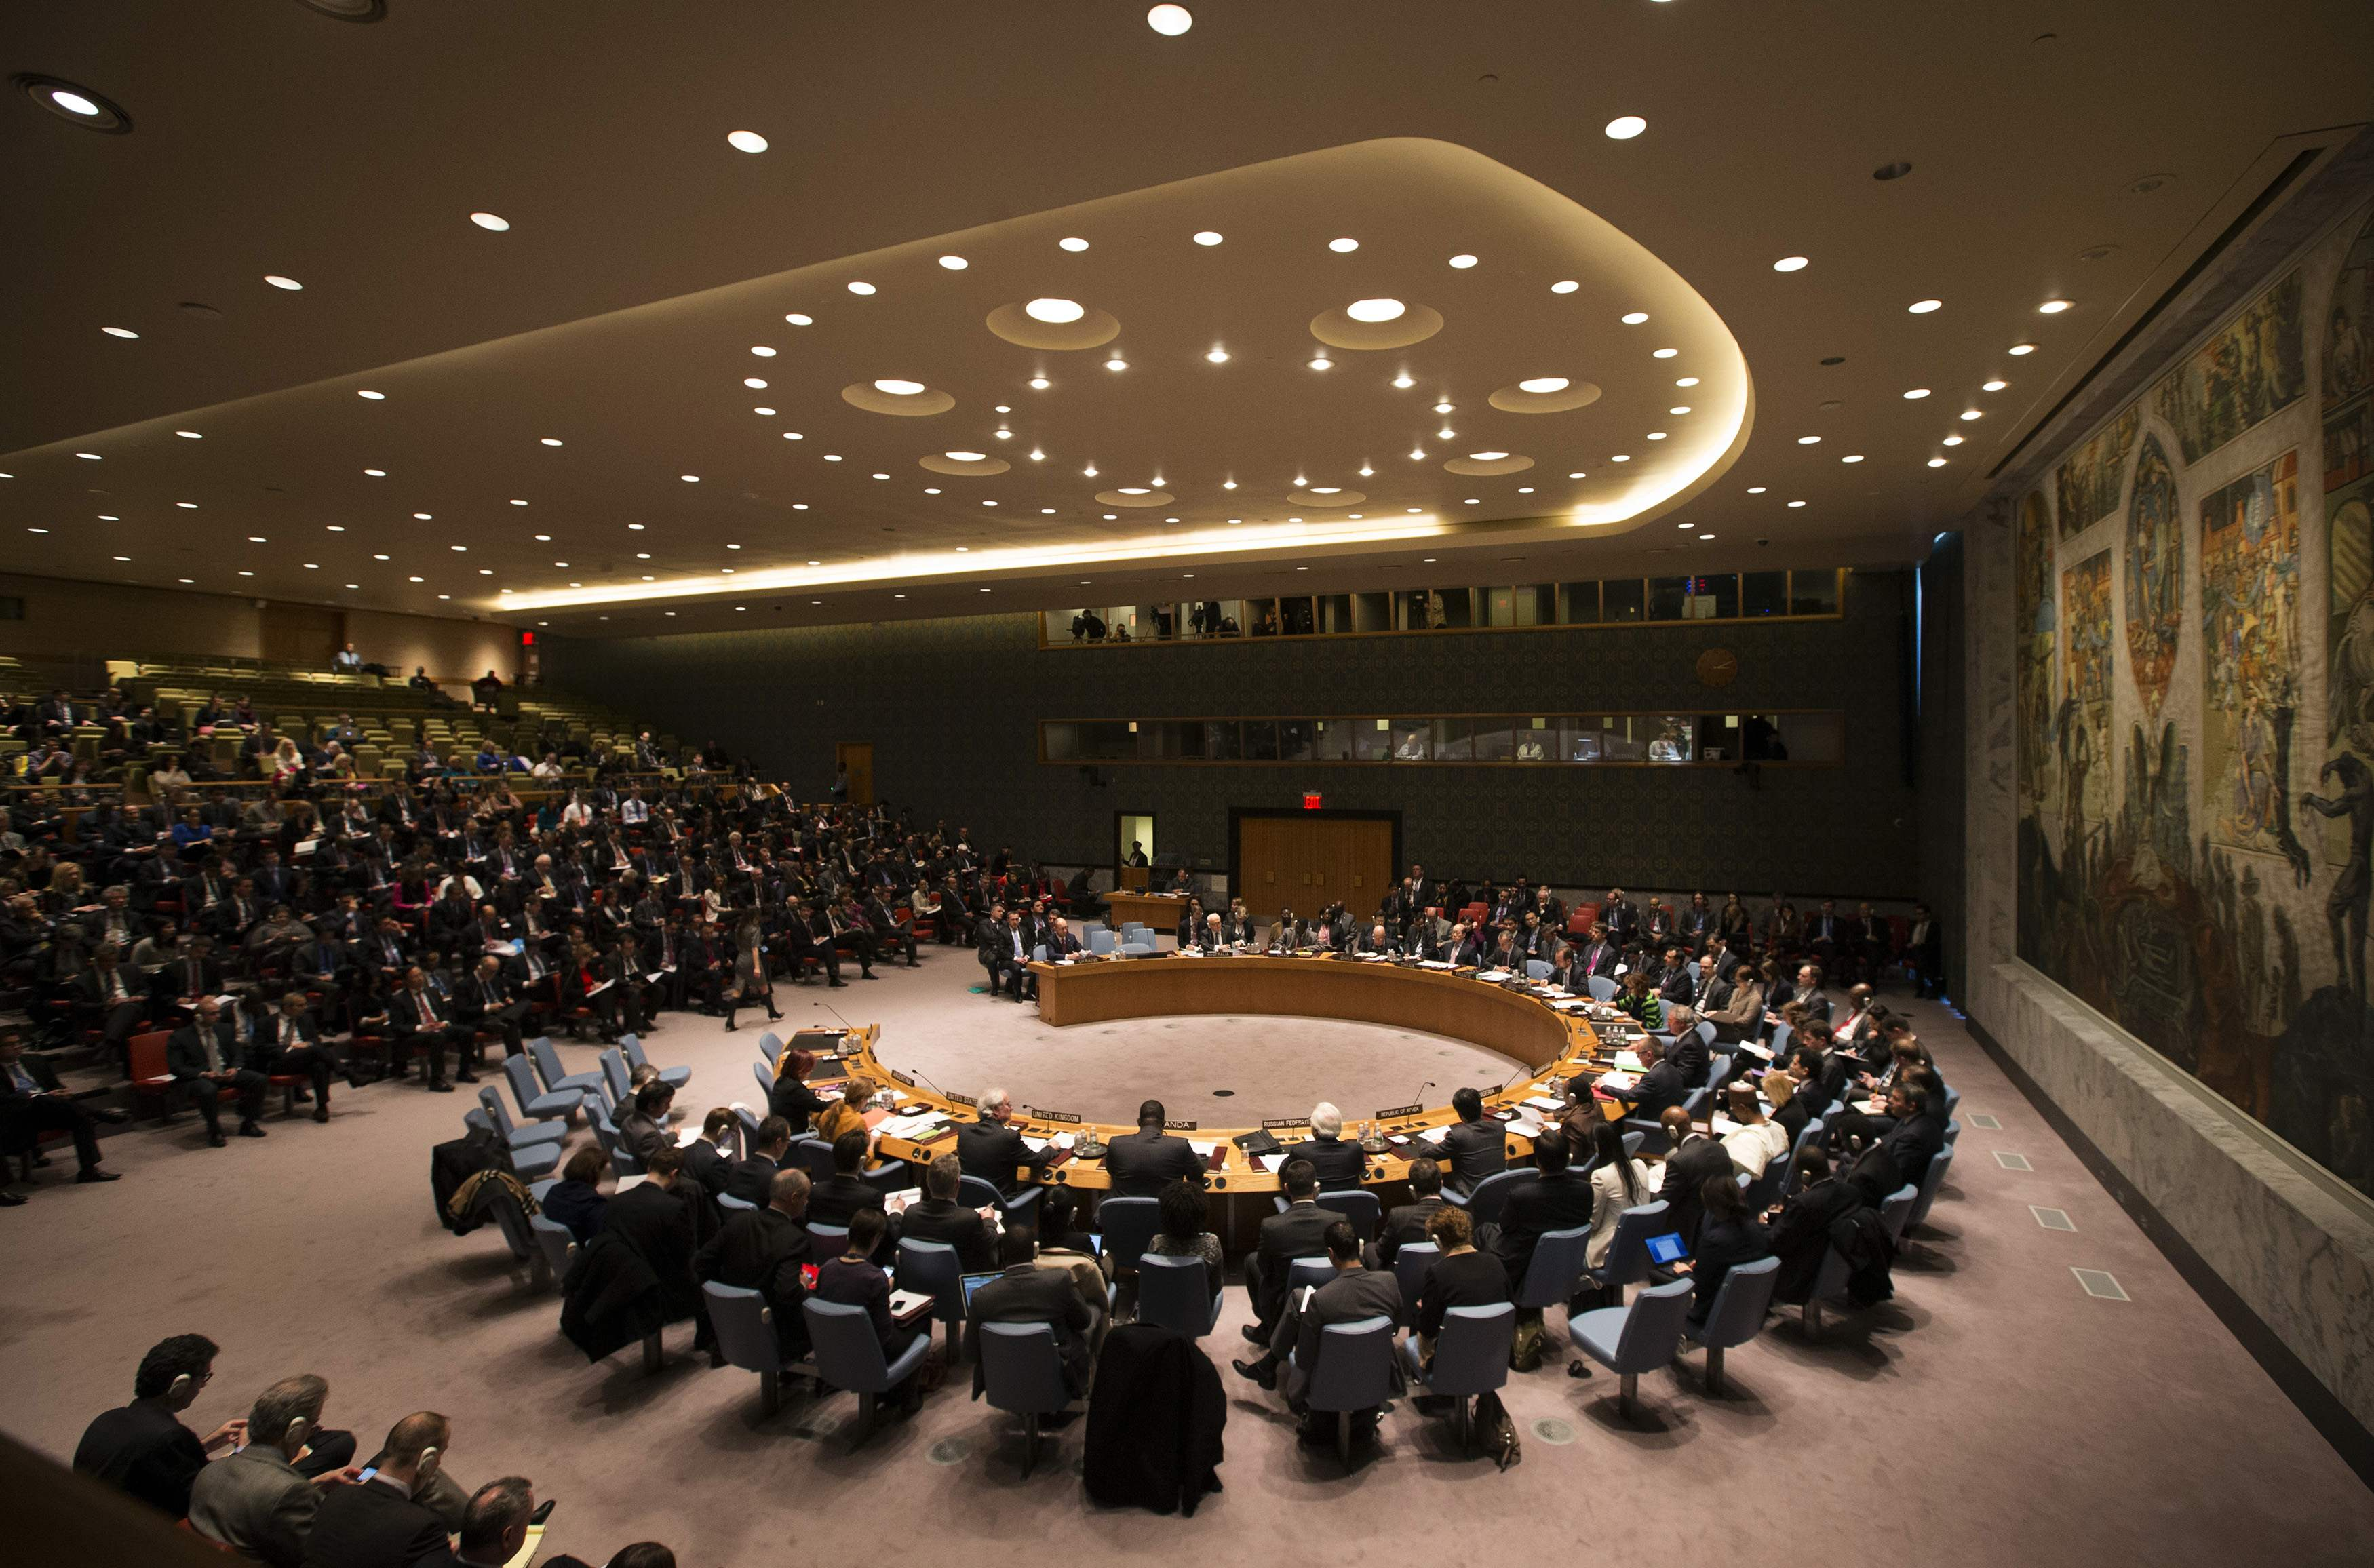 Зал заседаний Совета Безопасности ООН фото 1